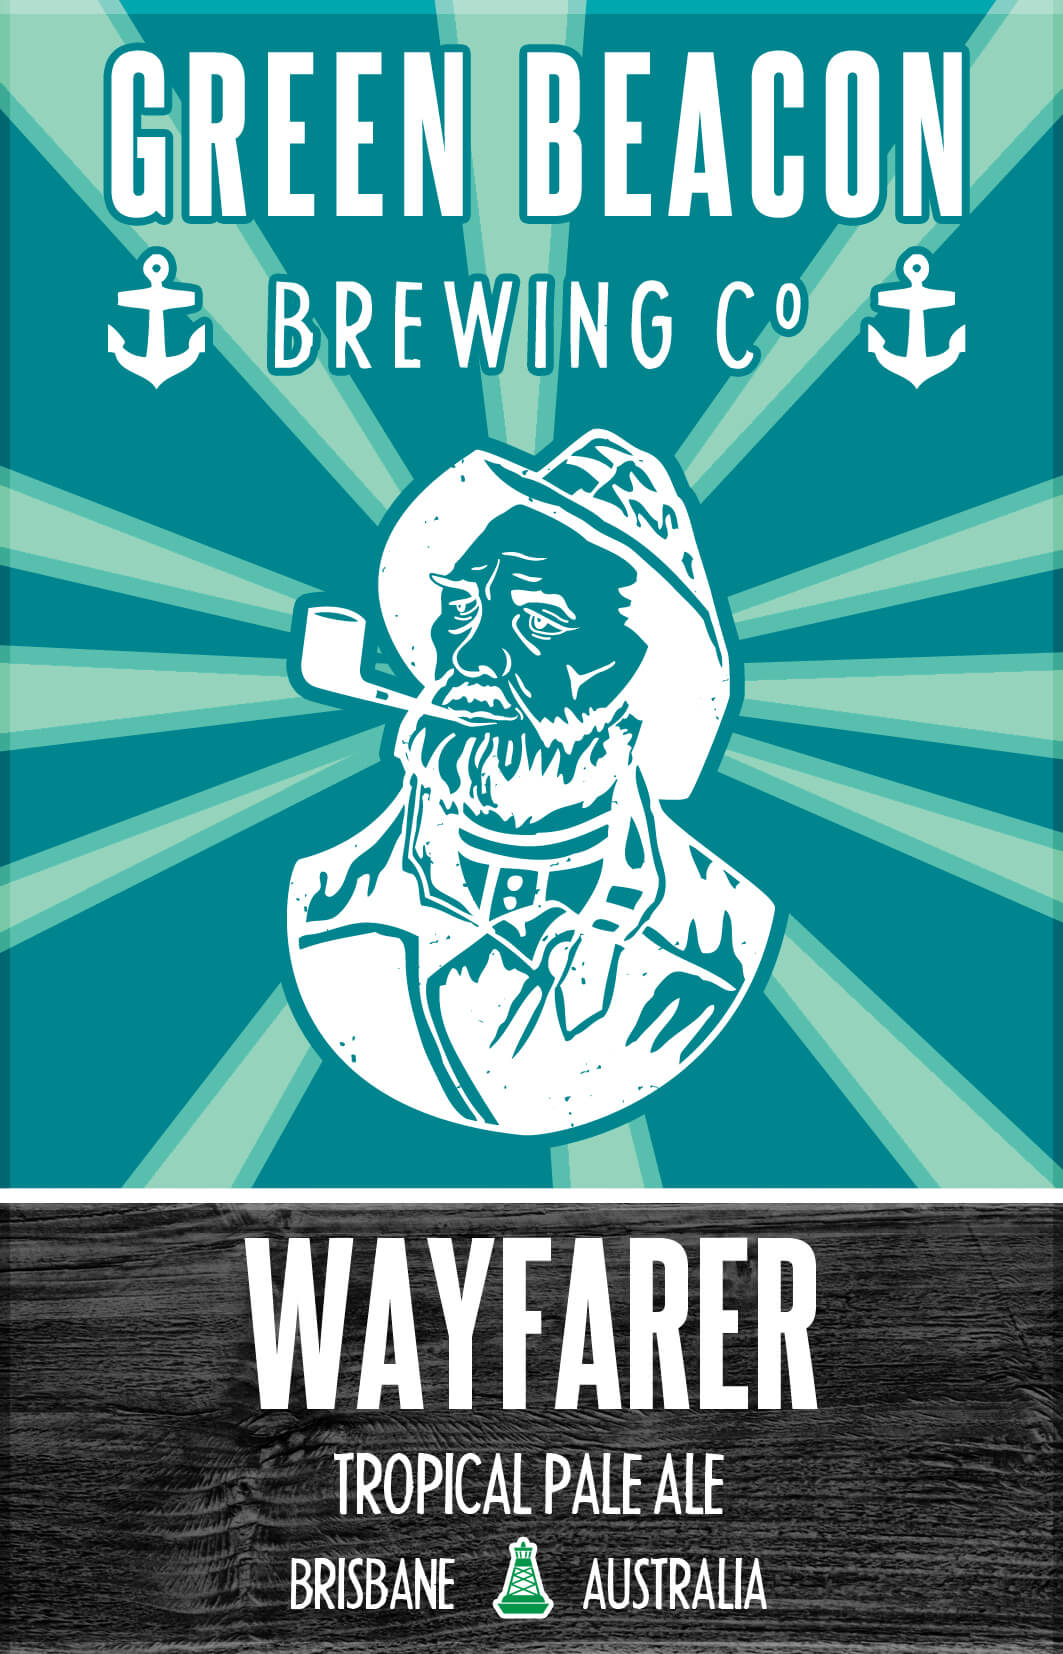 wayfarer-new-colour-and-dimensionteal (1).jpg